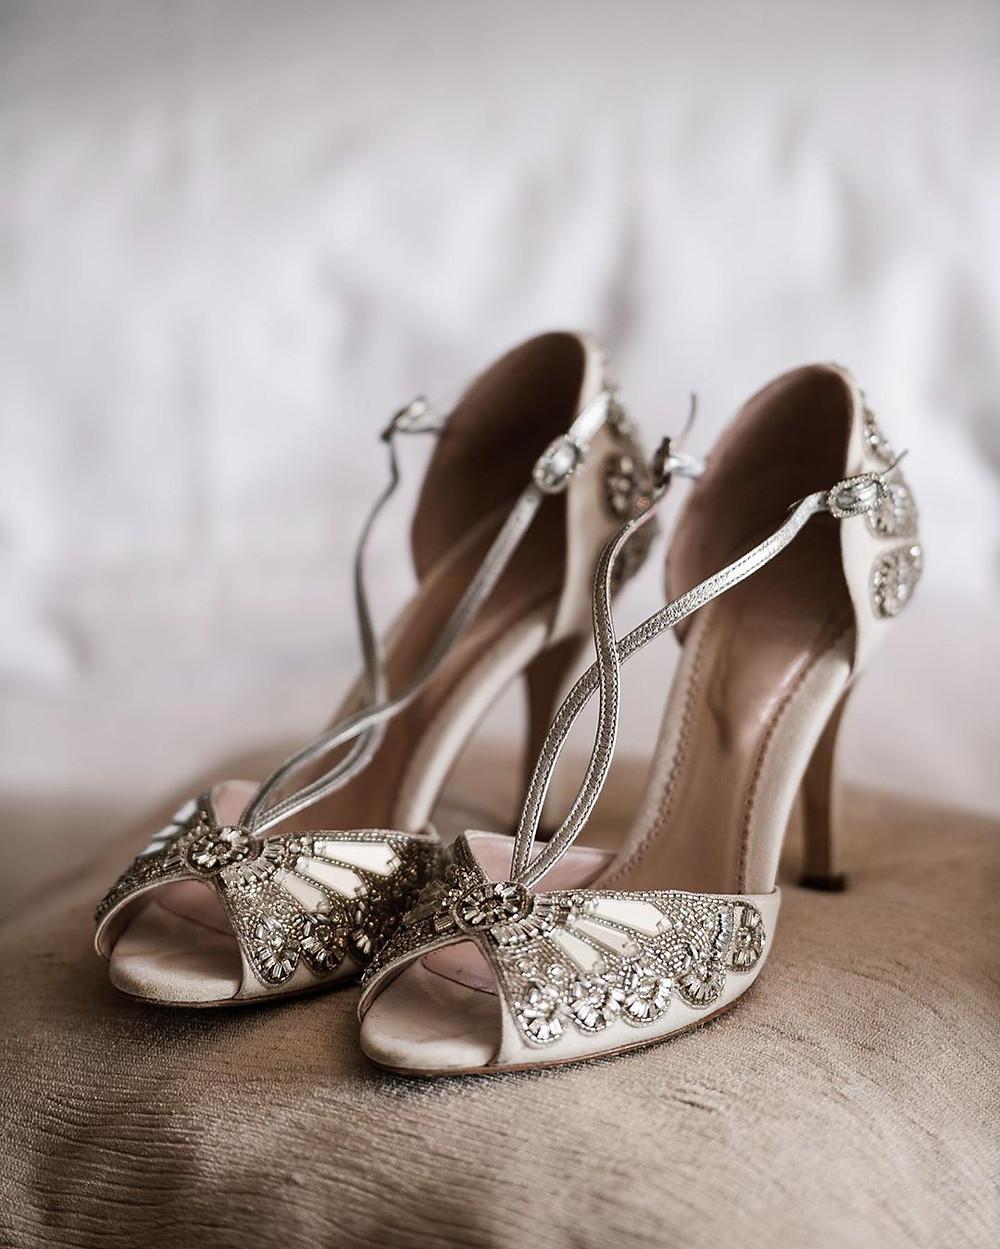 Emmy London Victoria Heels